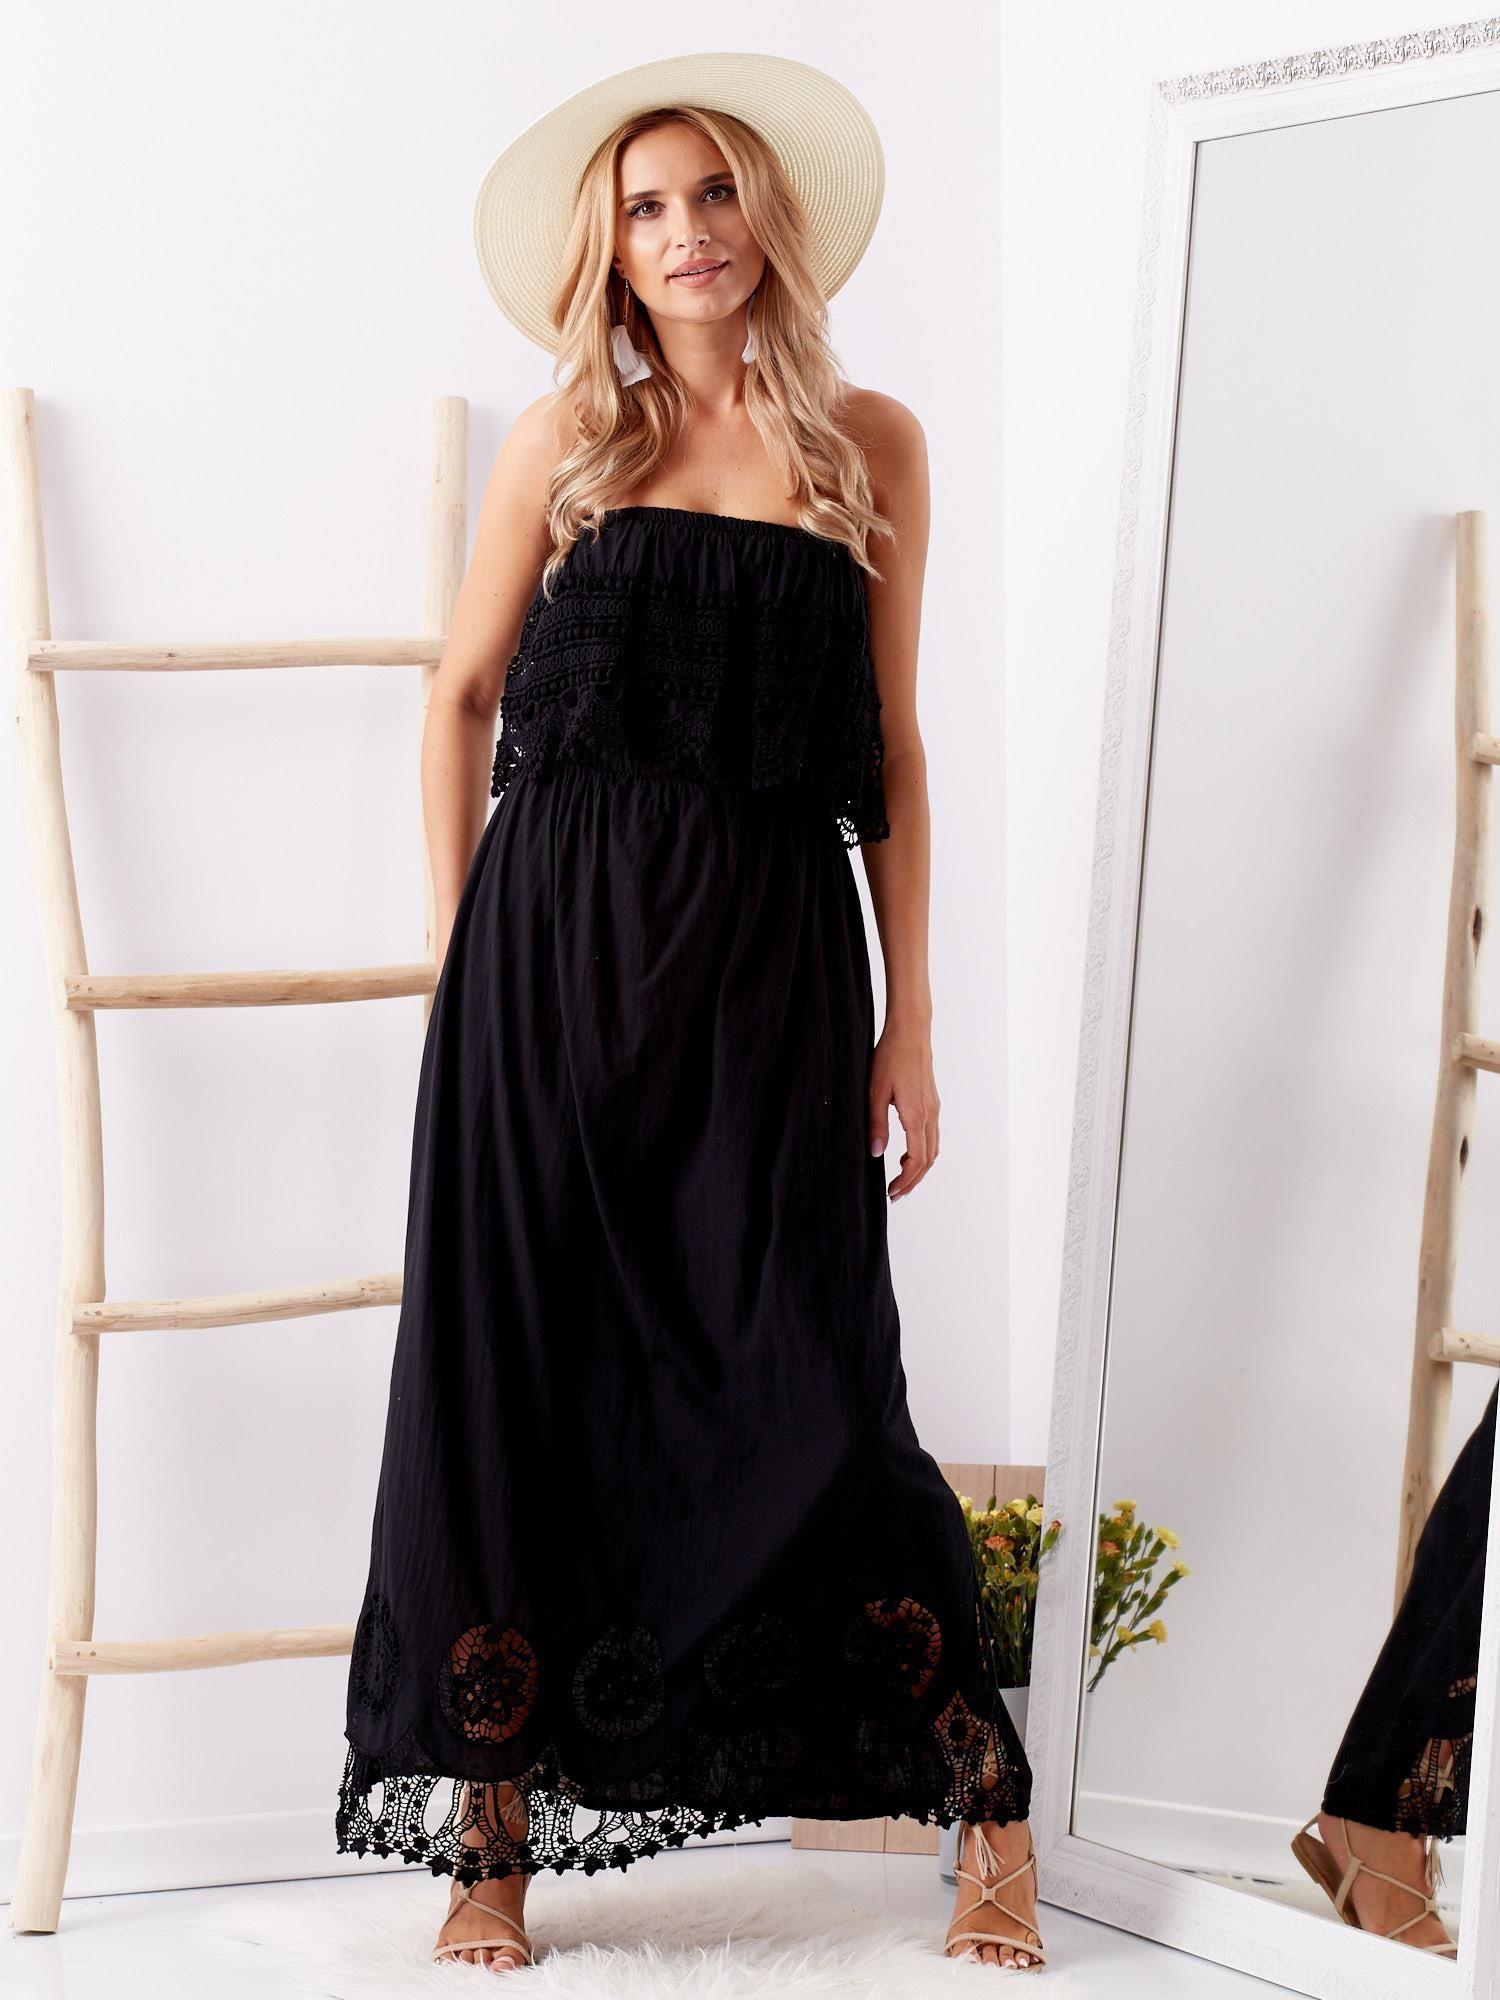 192a494b0aa8 Czarna sukienka maxi z dekoltem carmen - Sukienka hiszpanka - sklep ...